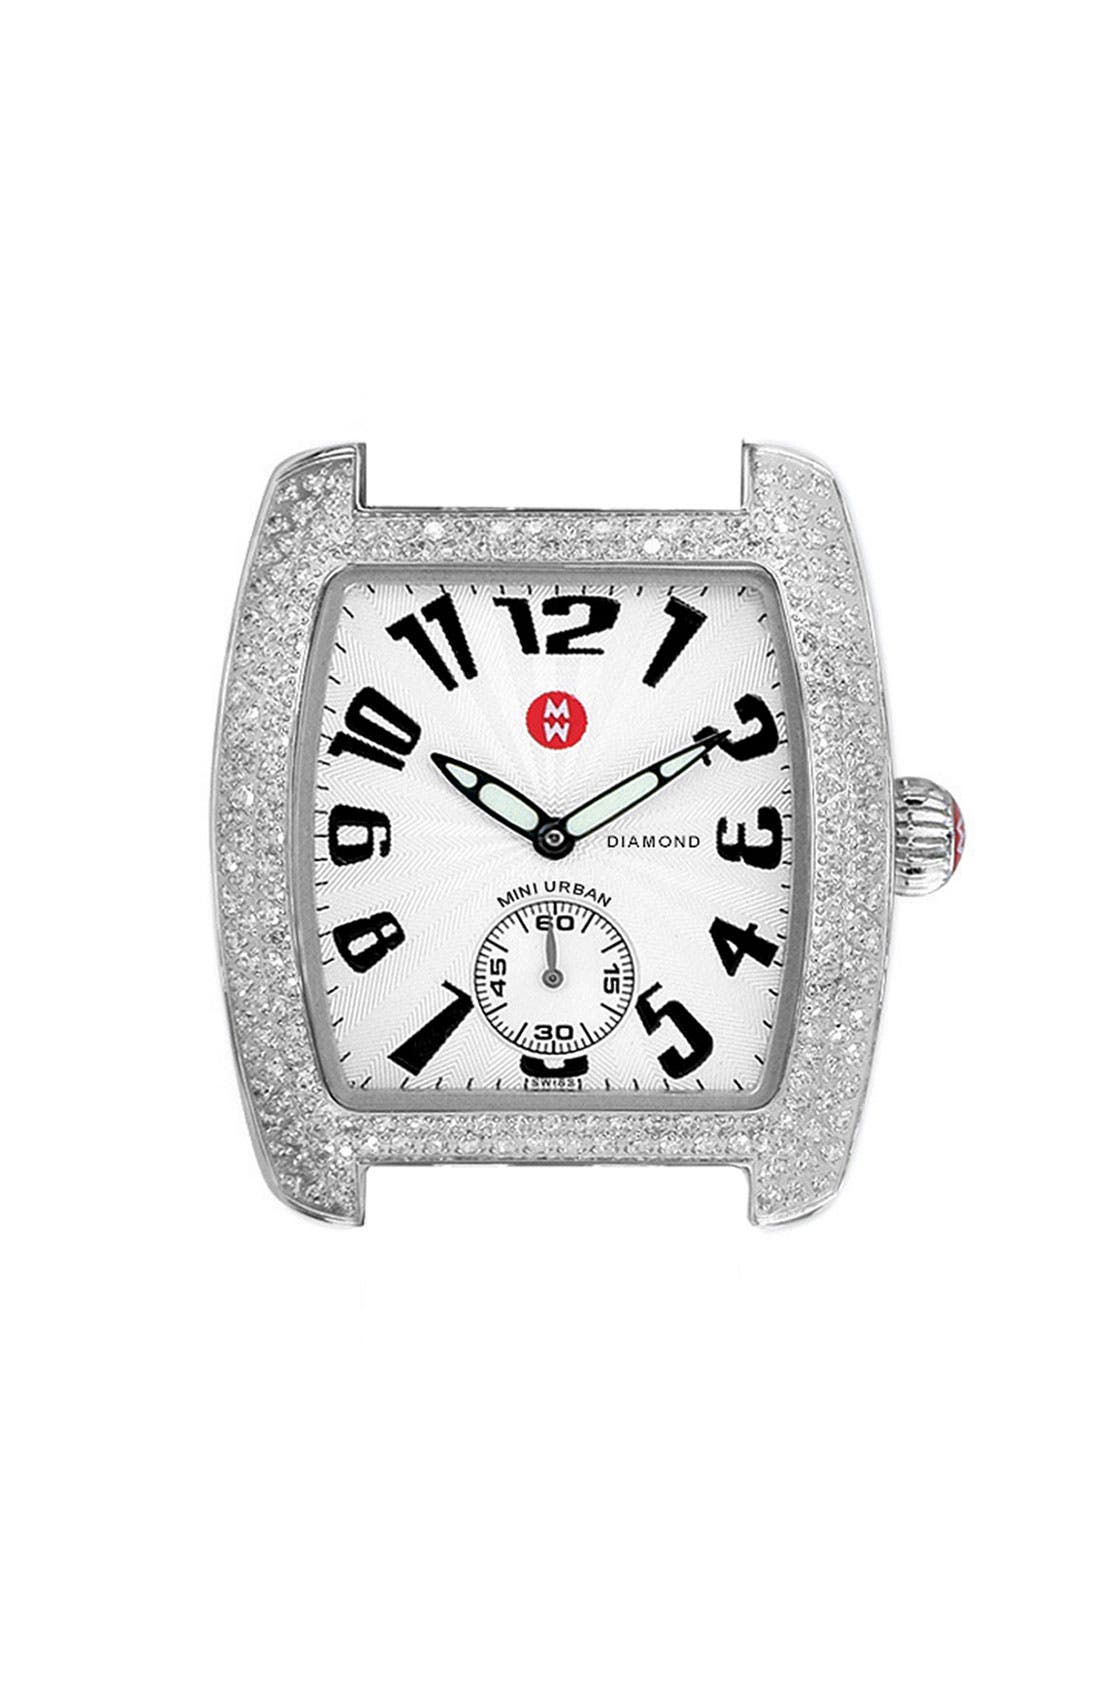 Main Image - MICHELE 'Urban Mini Diamond' Watch Case